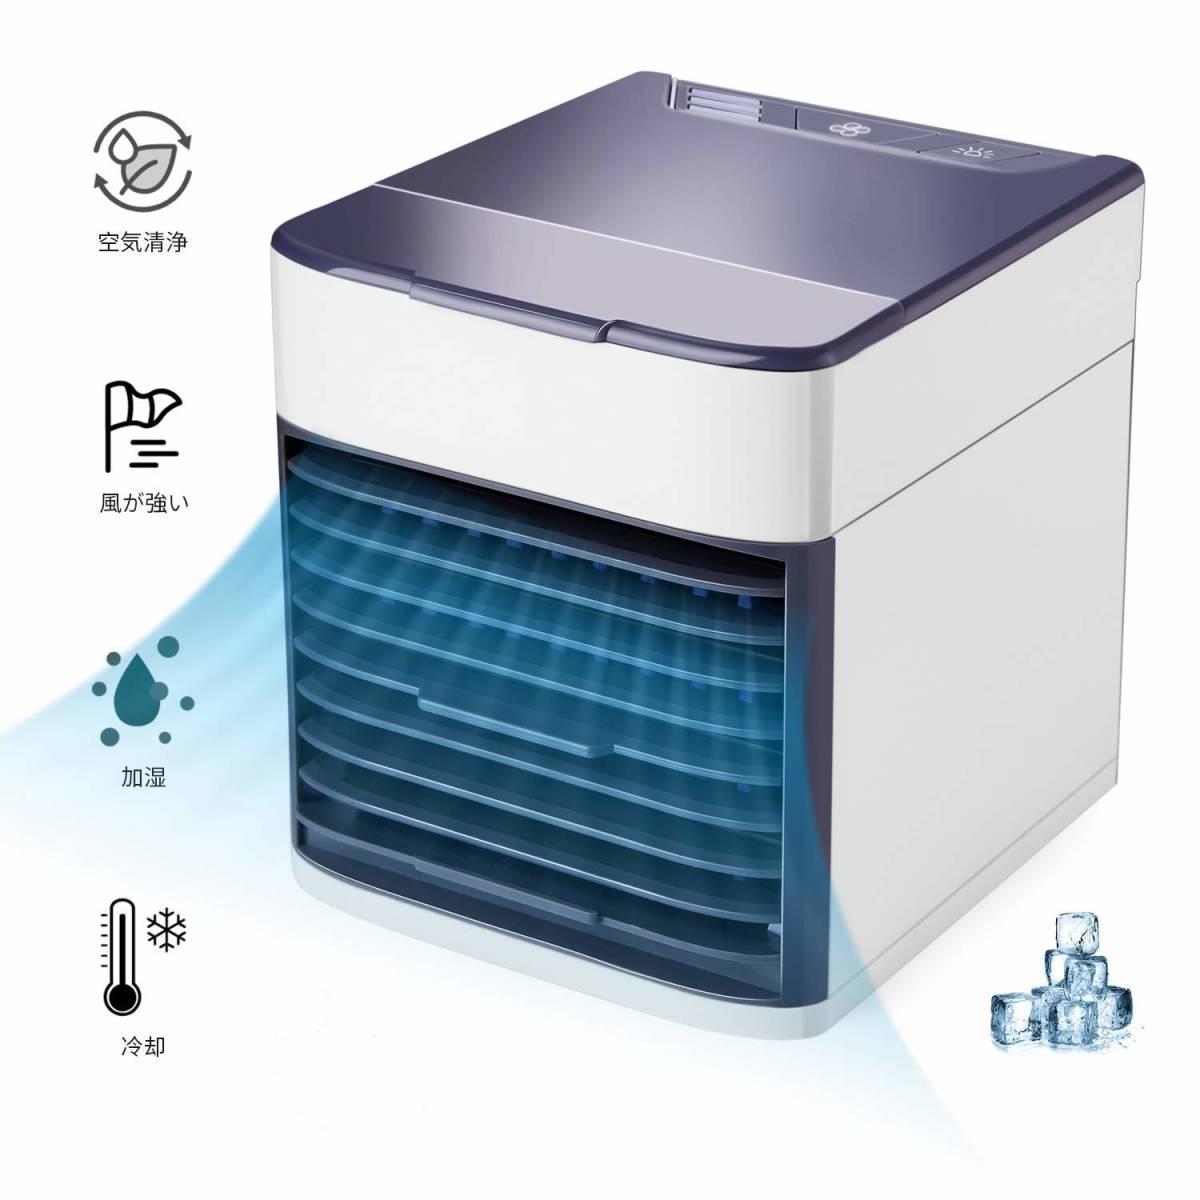 【最新版2019】【新品】Winhi 卓上扇風機 冷風扇風機 卓上冷風扇 最新バージョン コンパクト 風量3段階 小型 気化式冷風機 強風 加湿機能